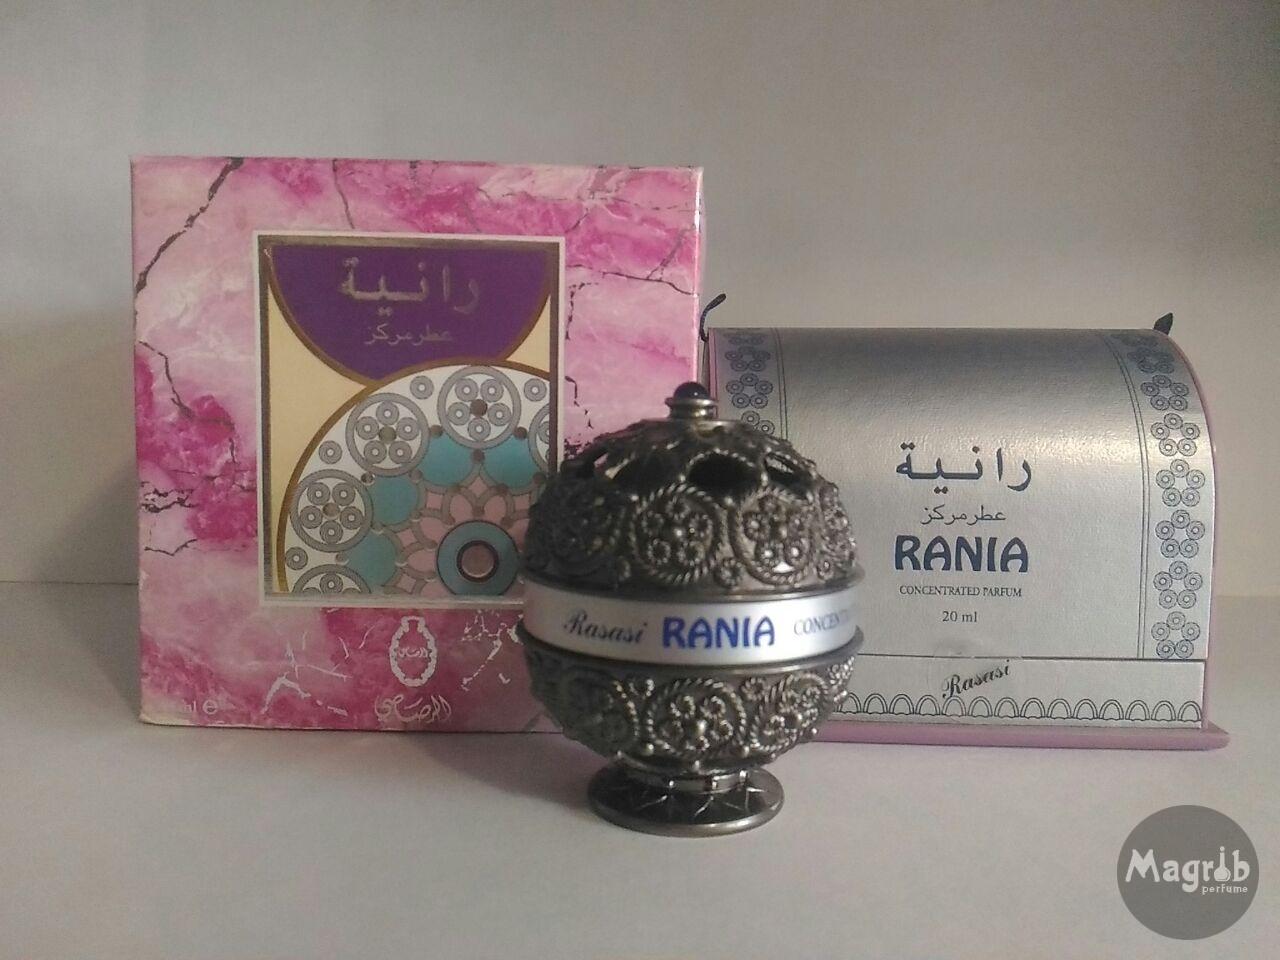 Rasasi- Rania 20ml- масляные духи.